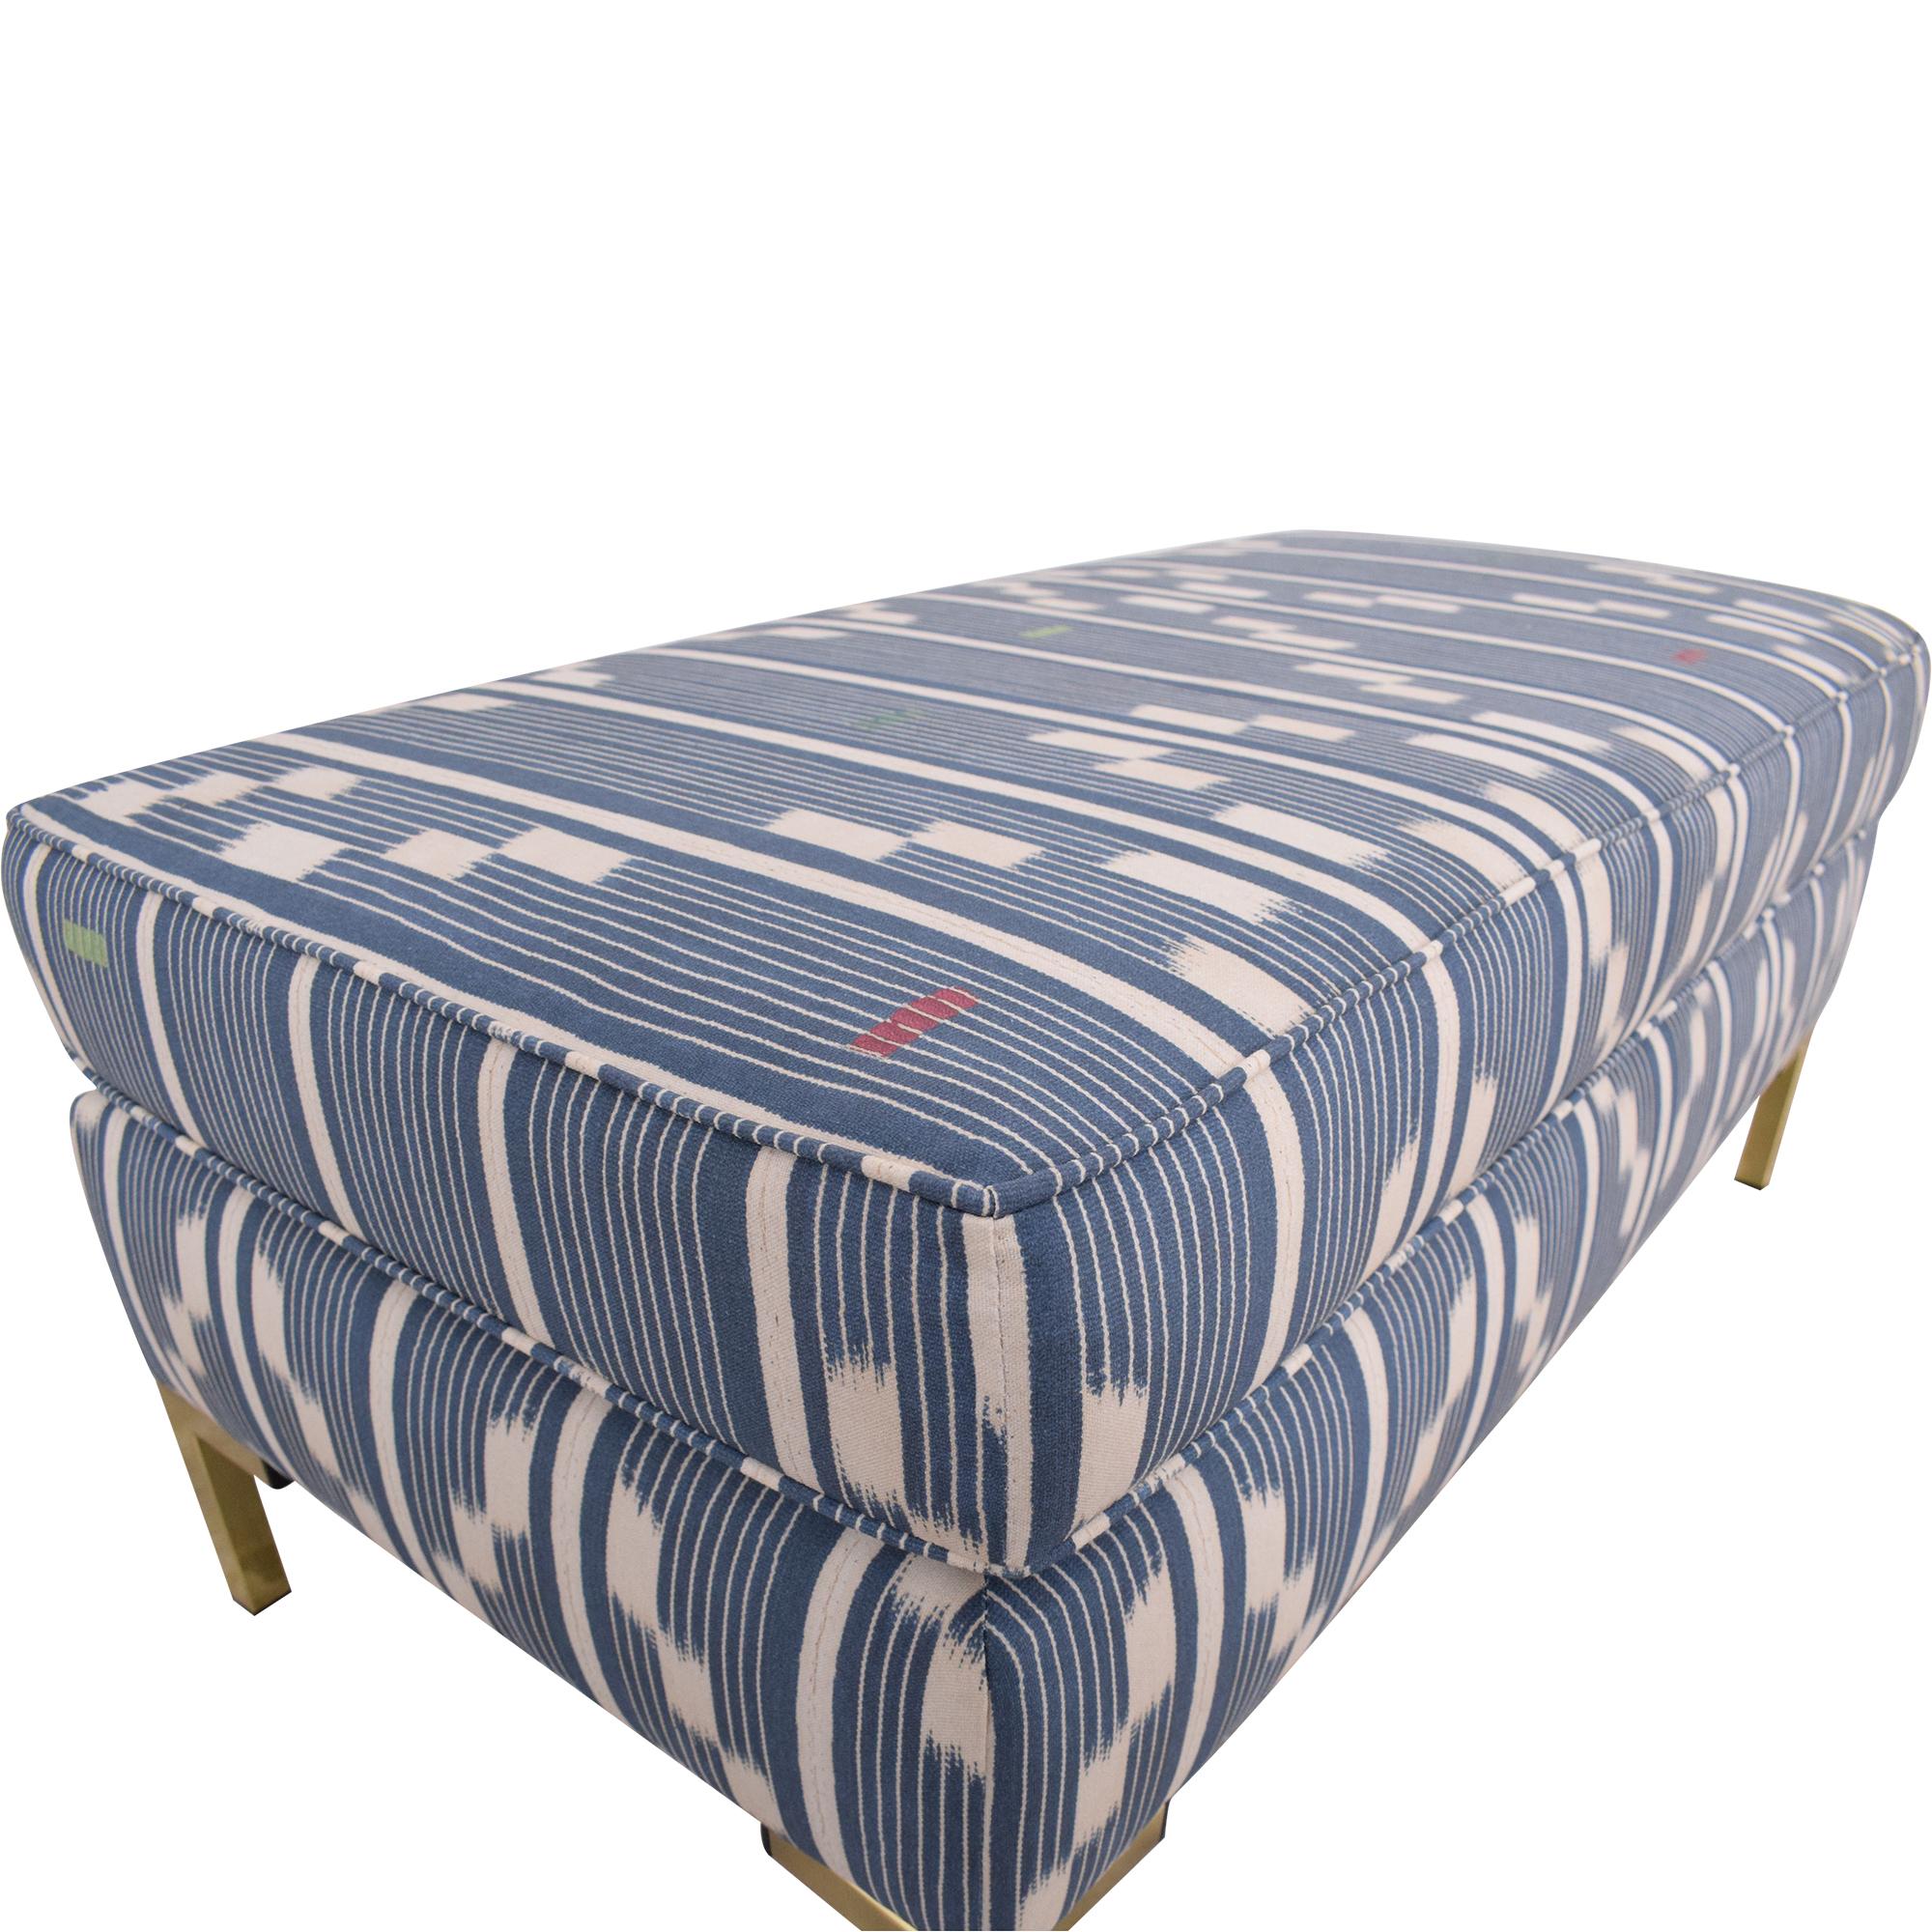 buy The Inside Modern Bench in Linea Ikat The Inside